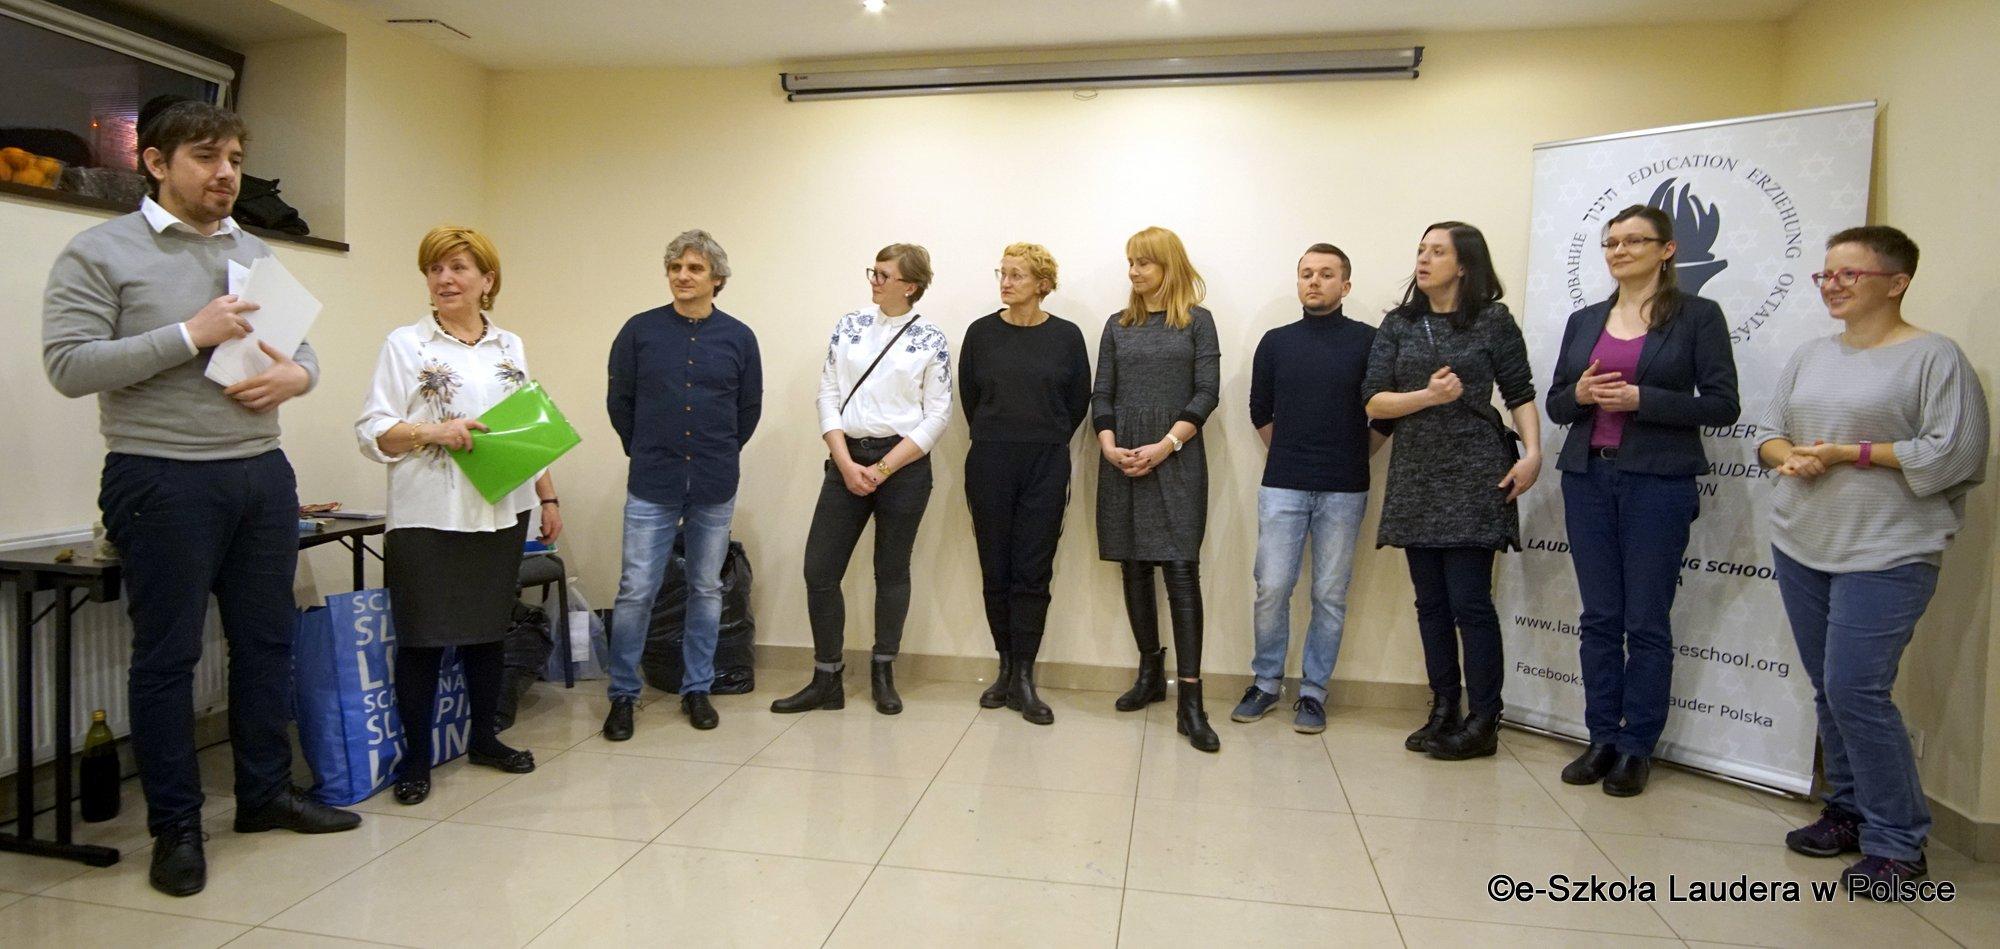 Szabaton e-szkoły laudera w Polsce